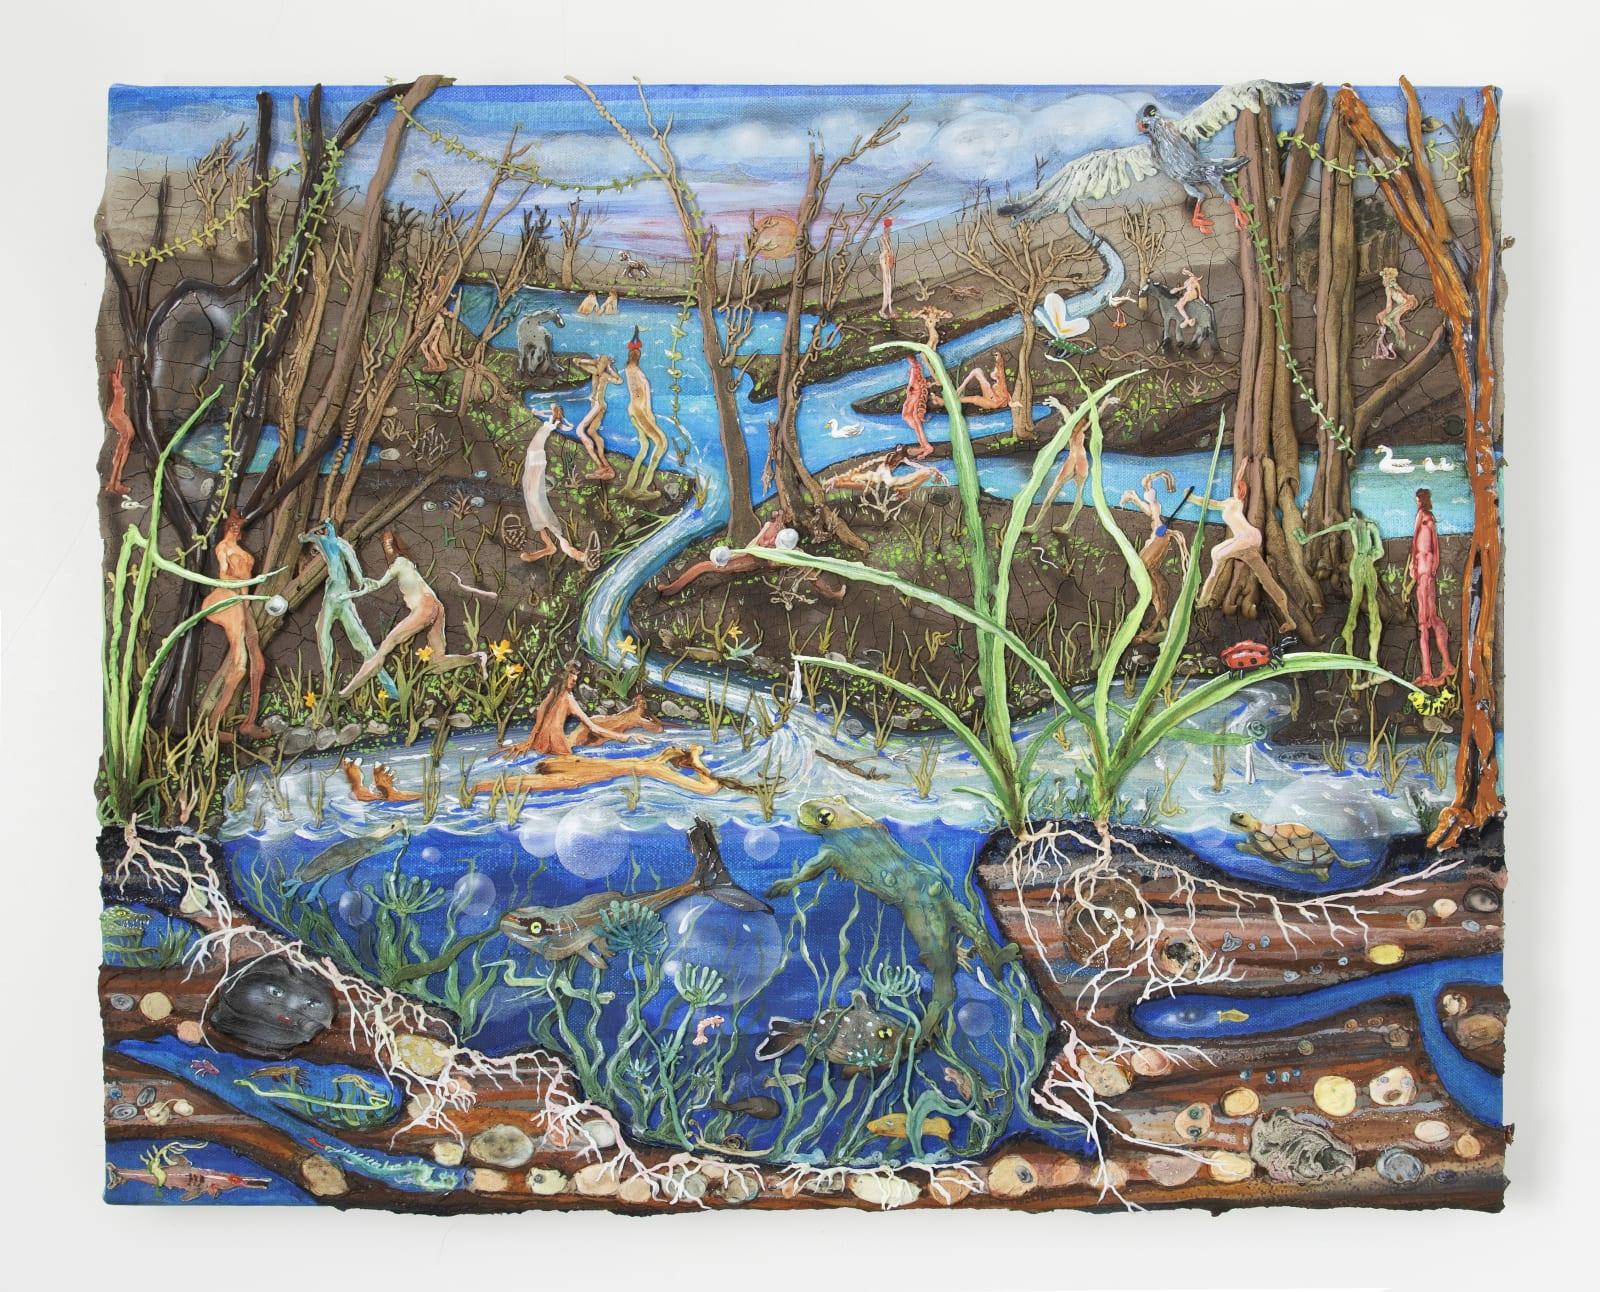 Kate Klingbeil, Primaveral, 2020, 16.25 x 20 x 2